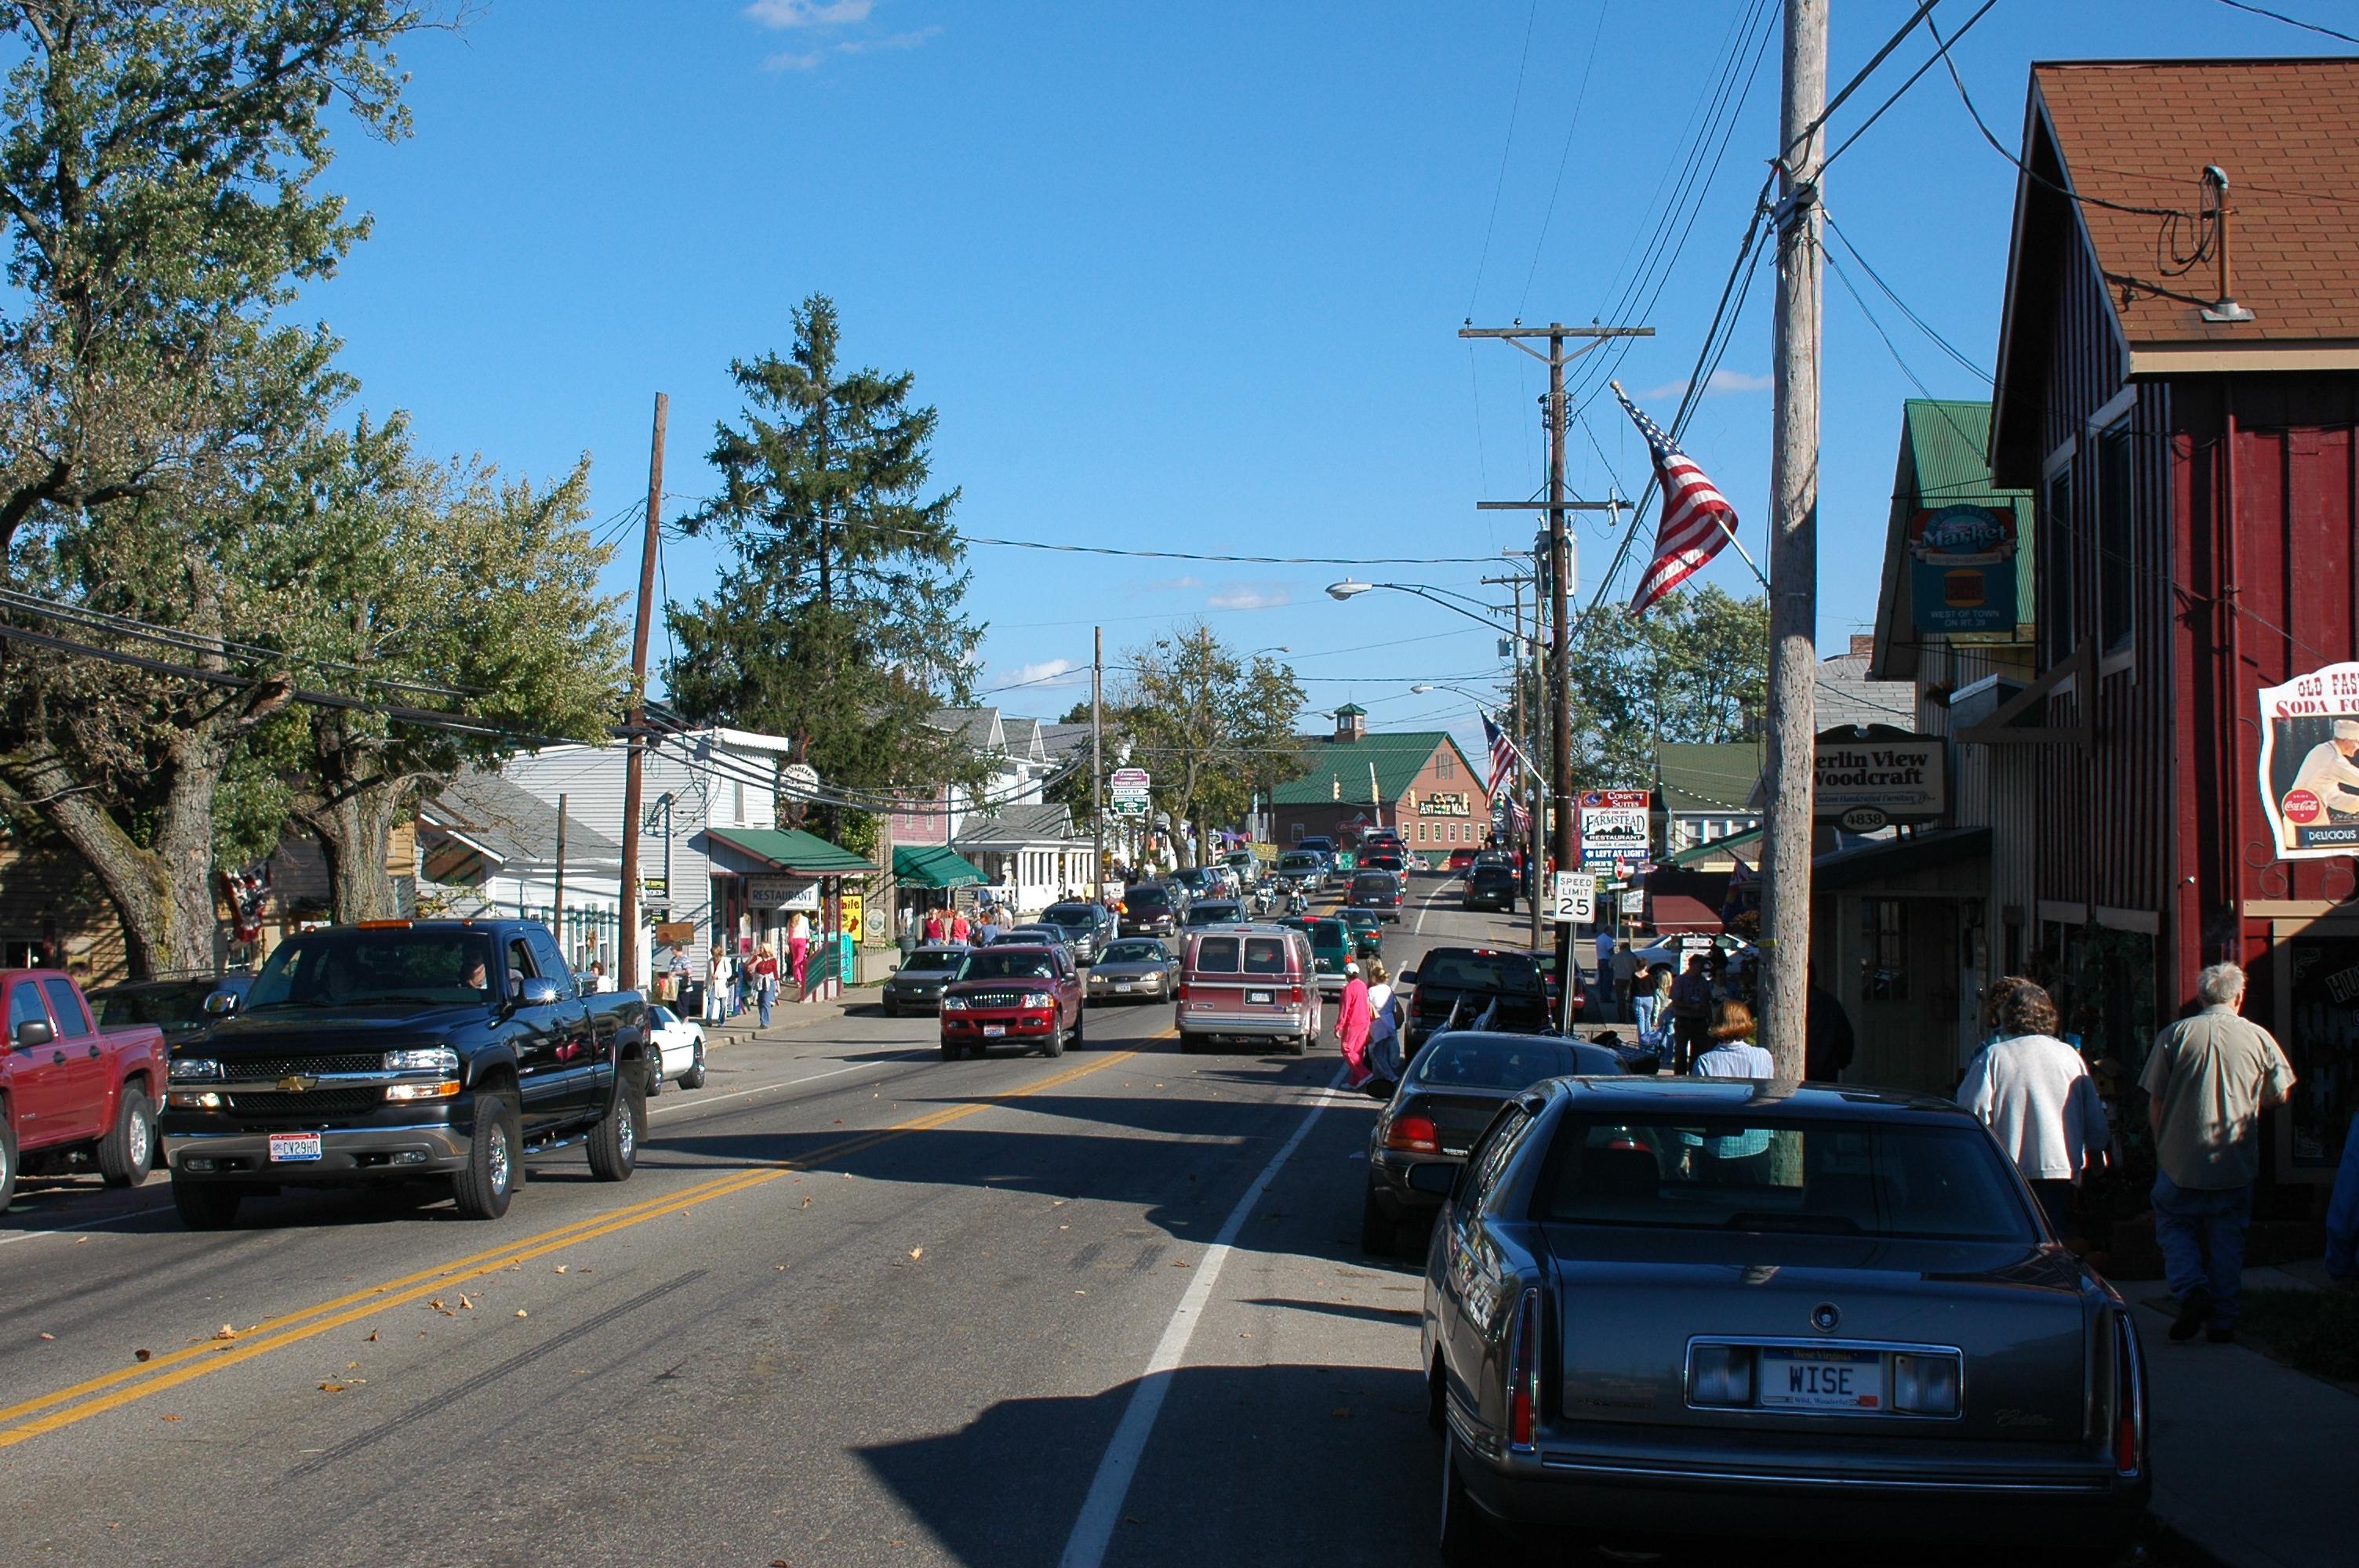 Ohio holmes county nashville - Ohio Holmes County Nashville 4